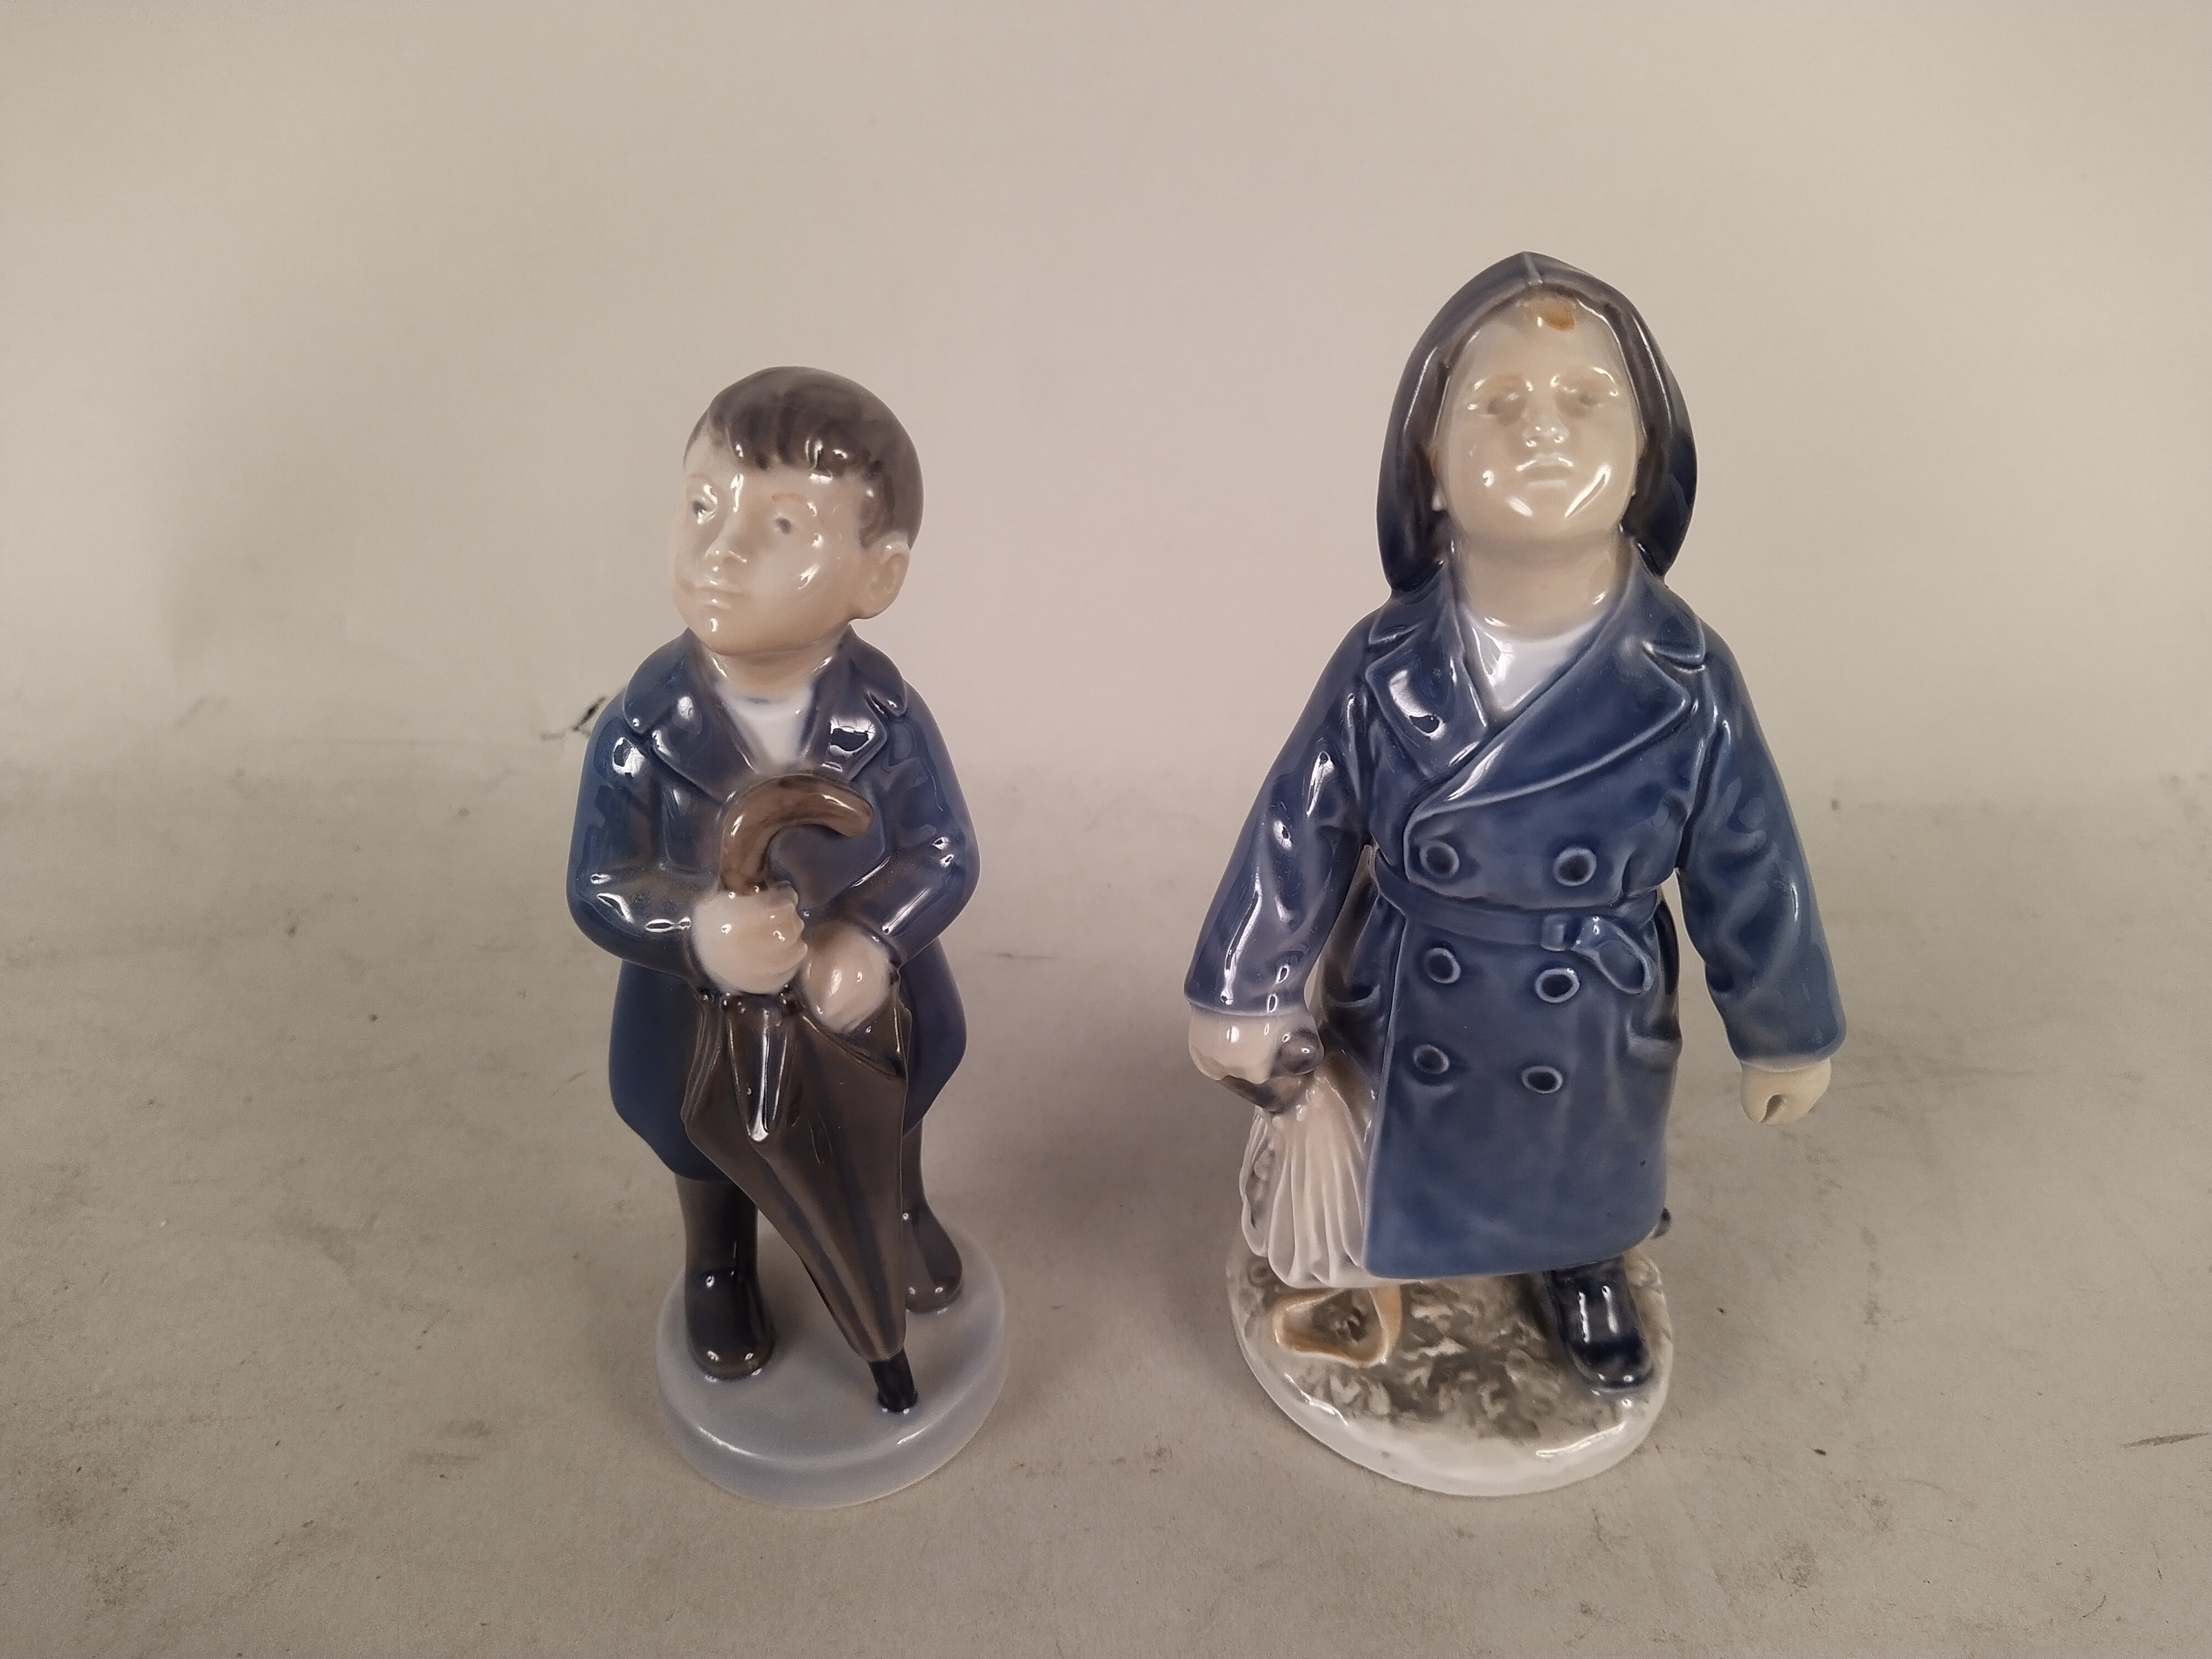 Four Copenhagen boy figurines, - Image 2 of 3